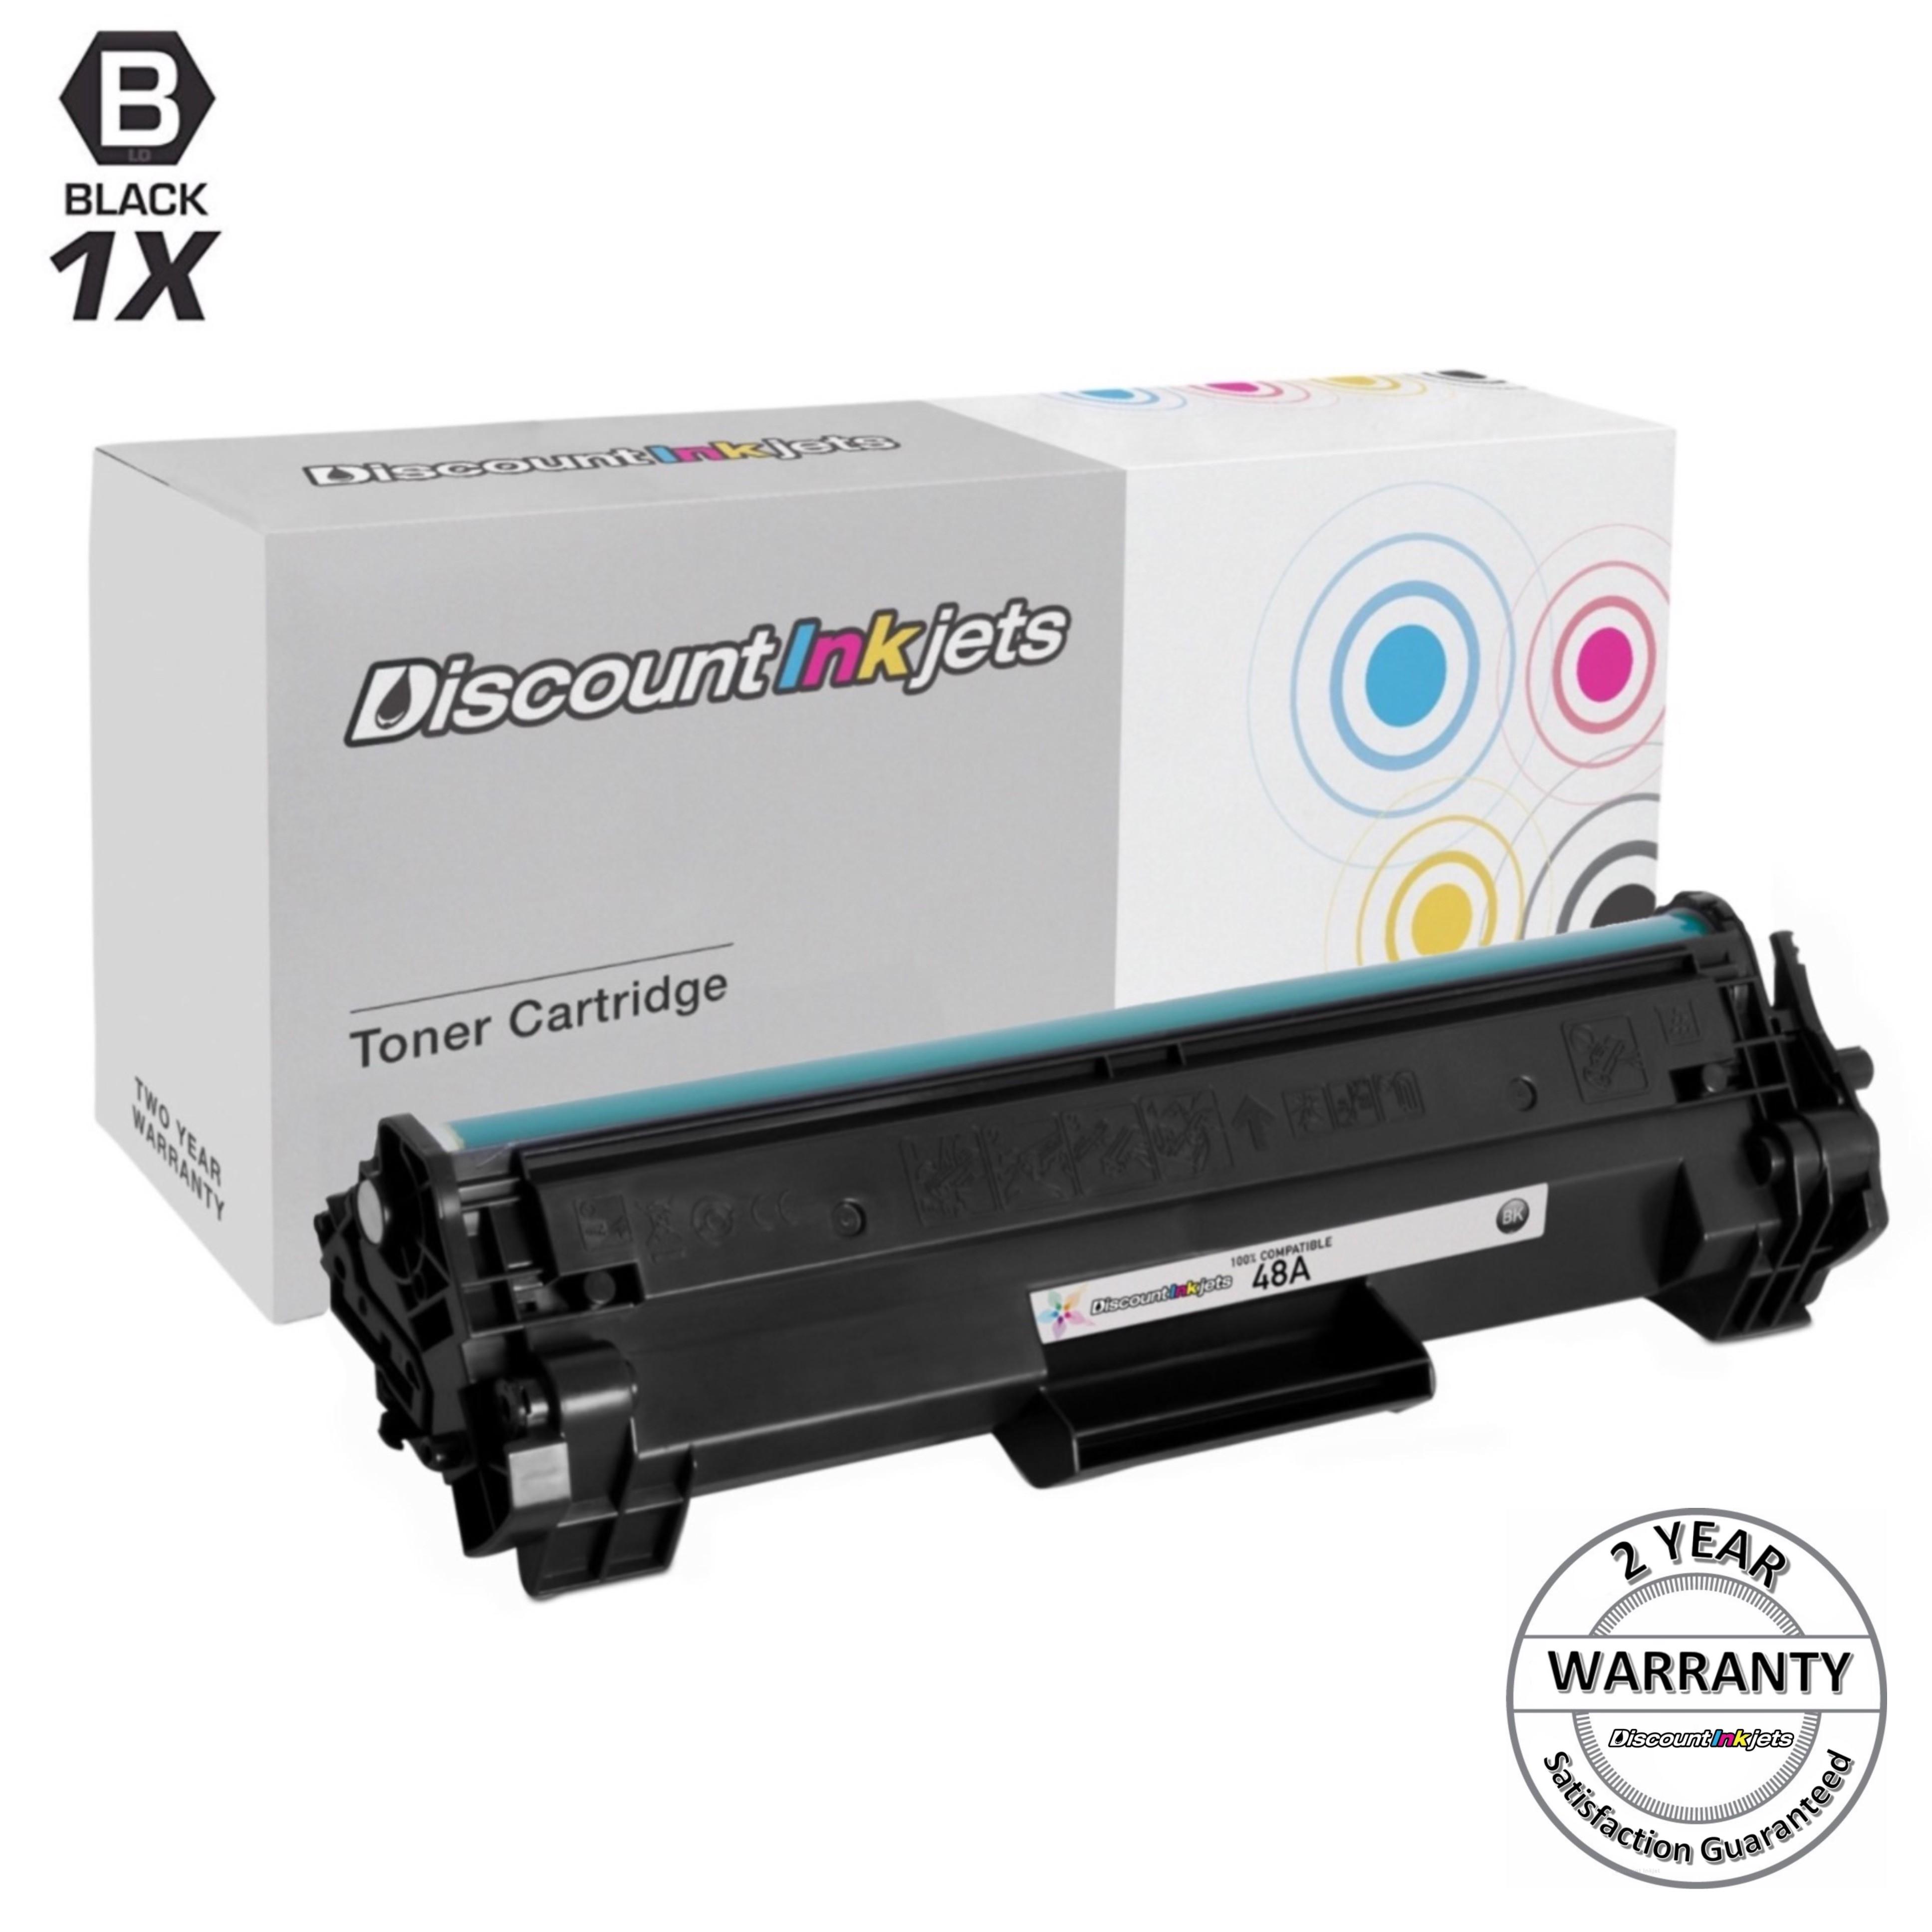 Details about New CF248A 48A Black Toner Cartridge for HP LaserJet Pro M15w  M28w Printer M15a